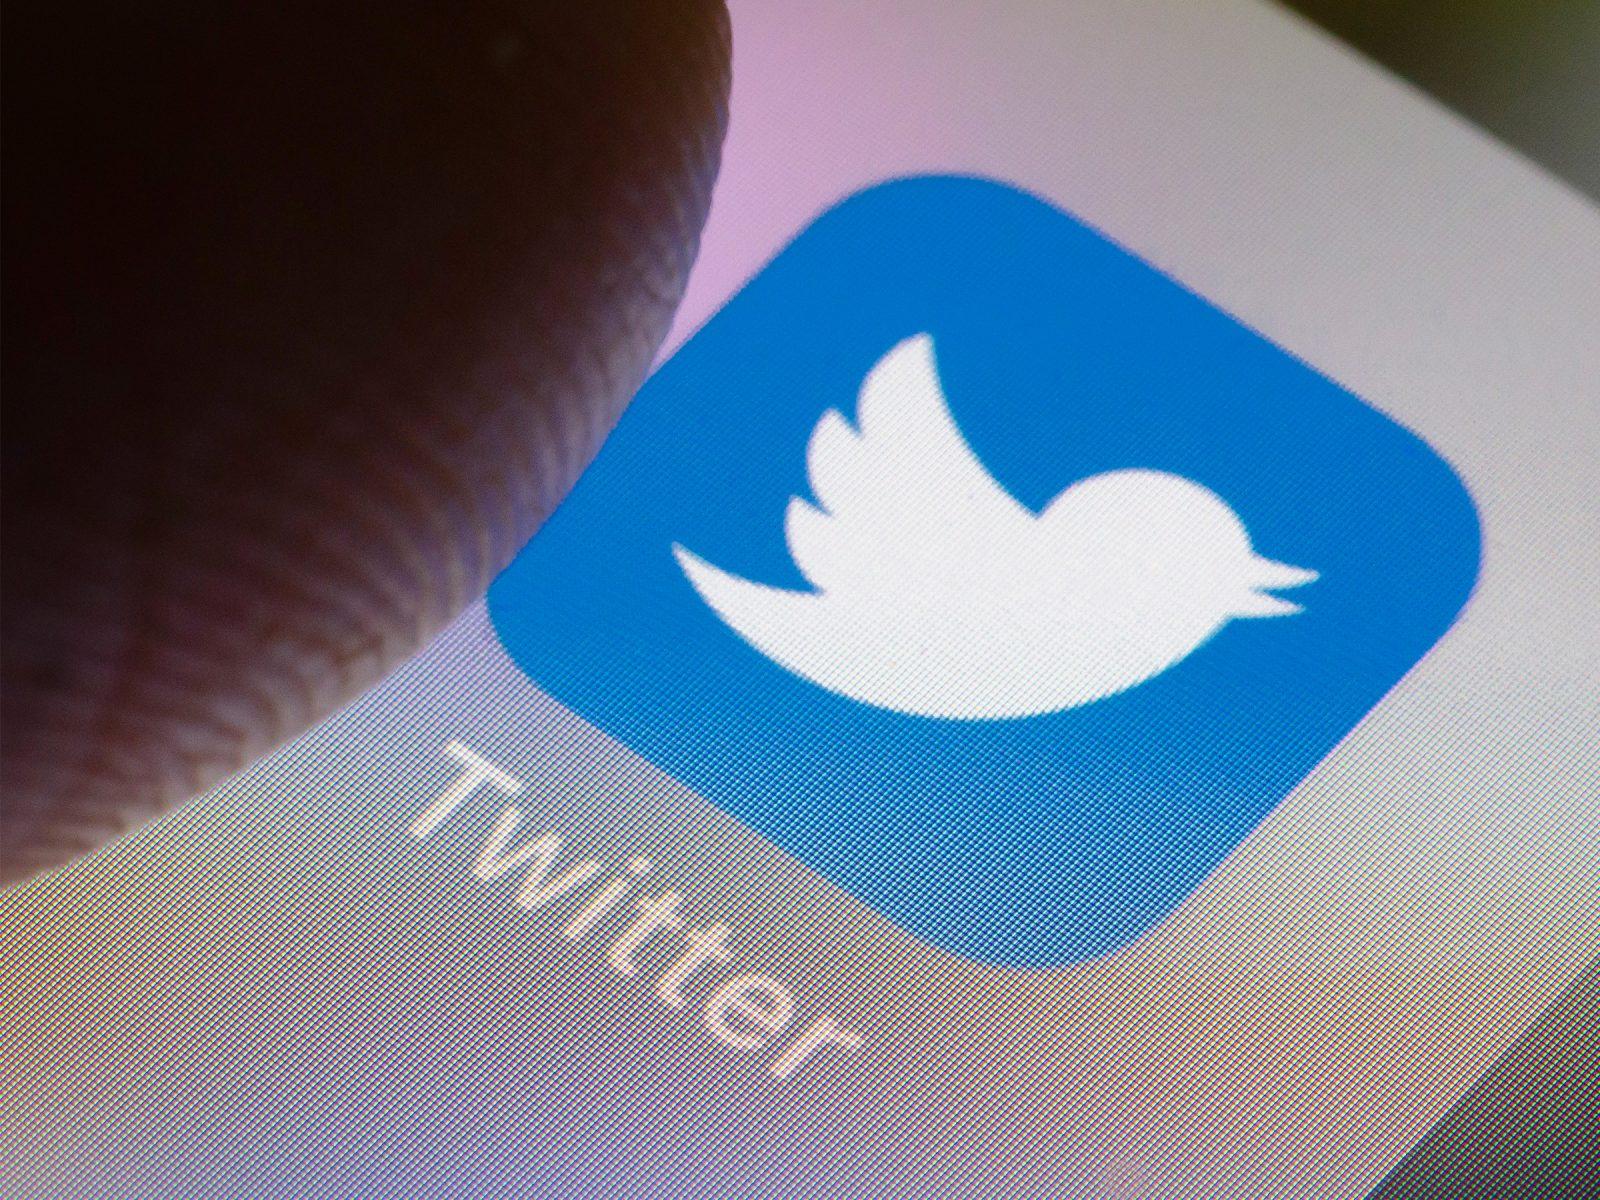 Social impacts of social media as #NotAllMen trends on Twitter